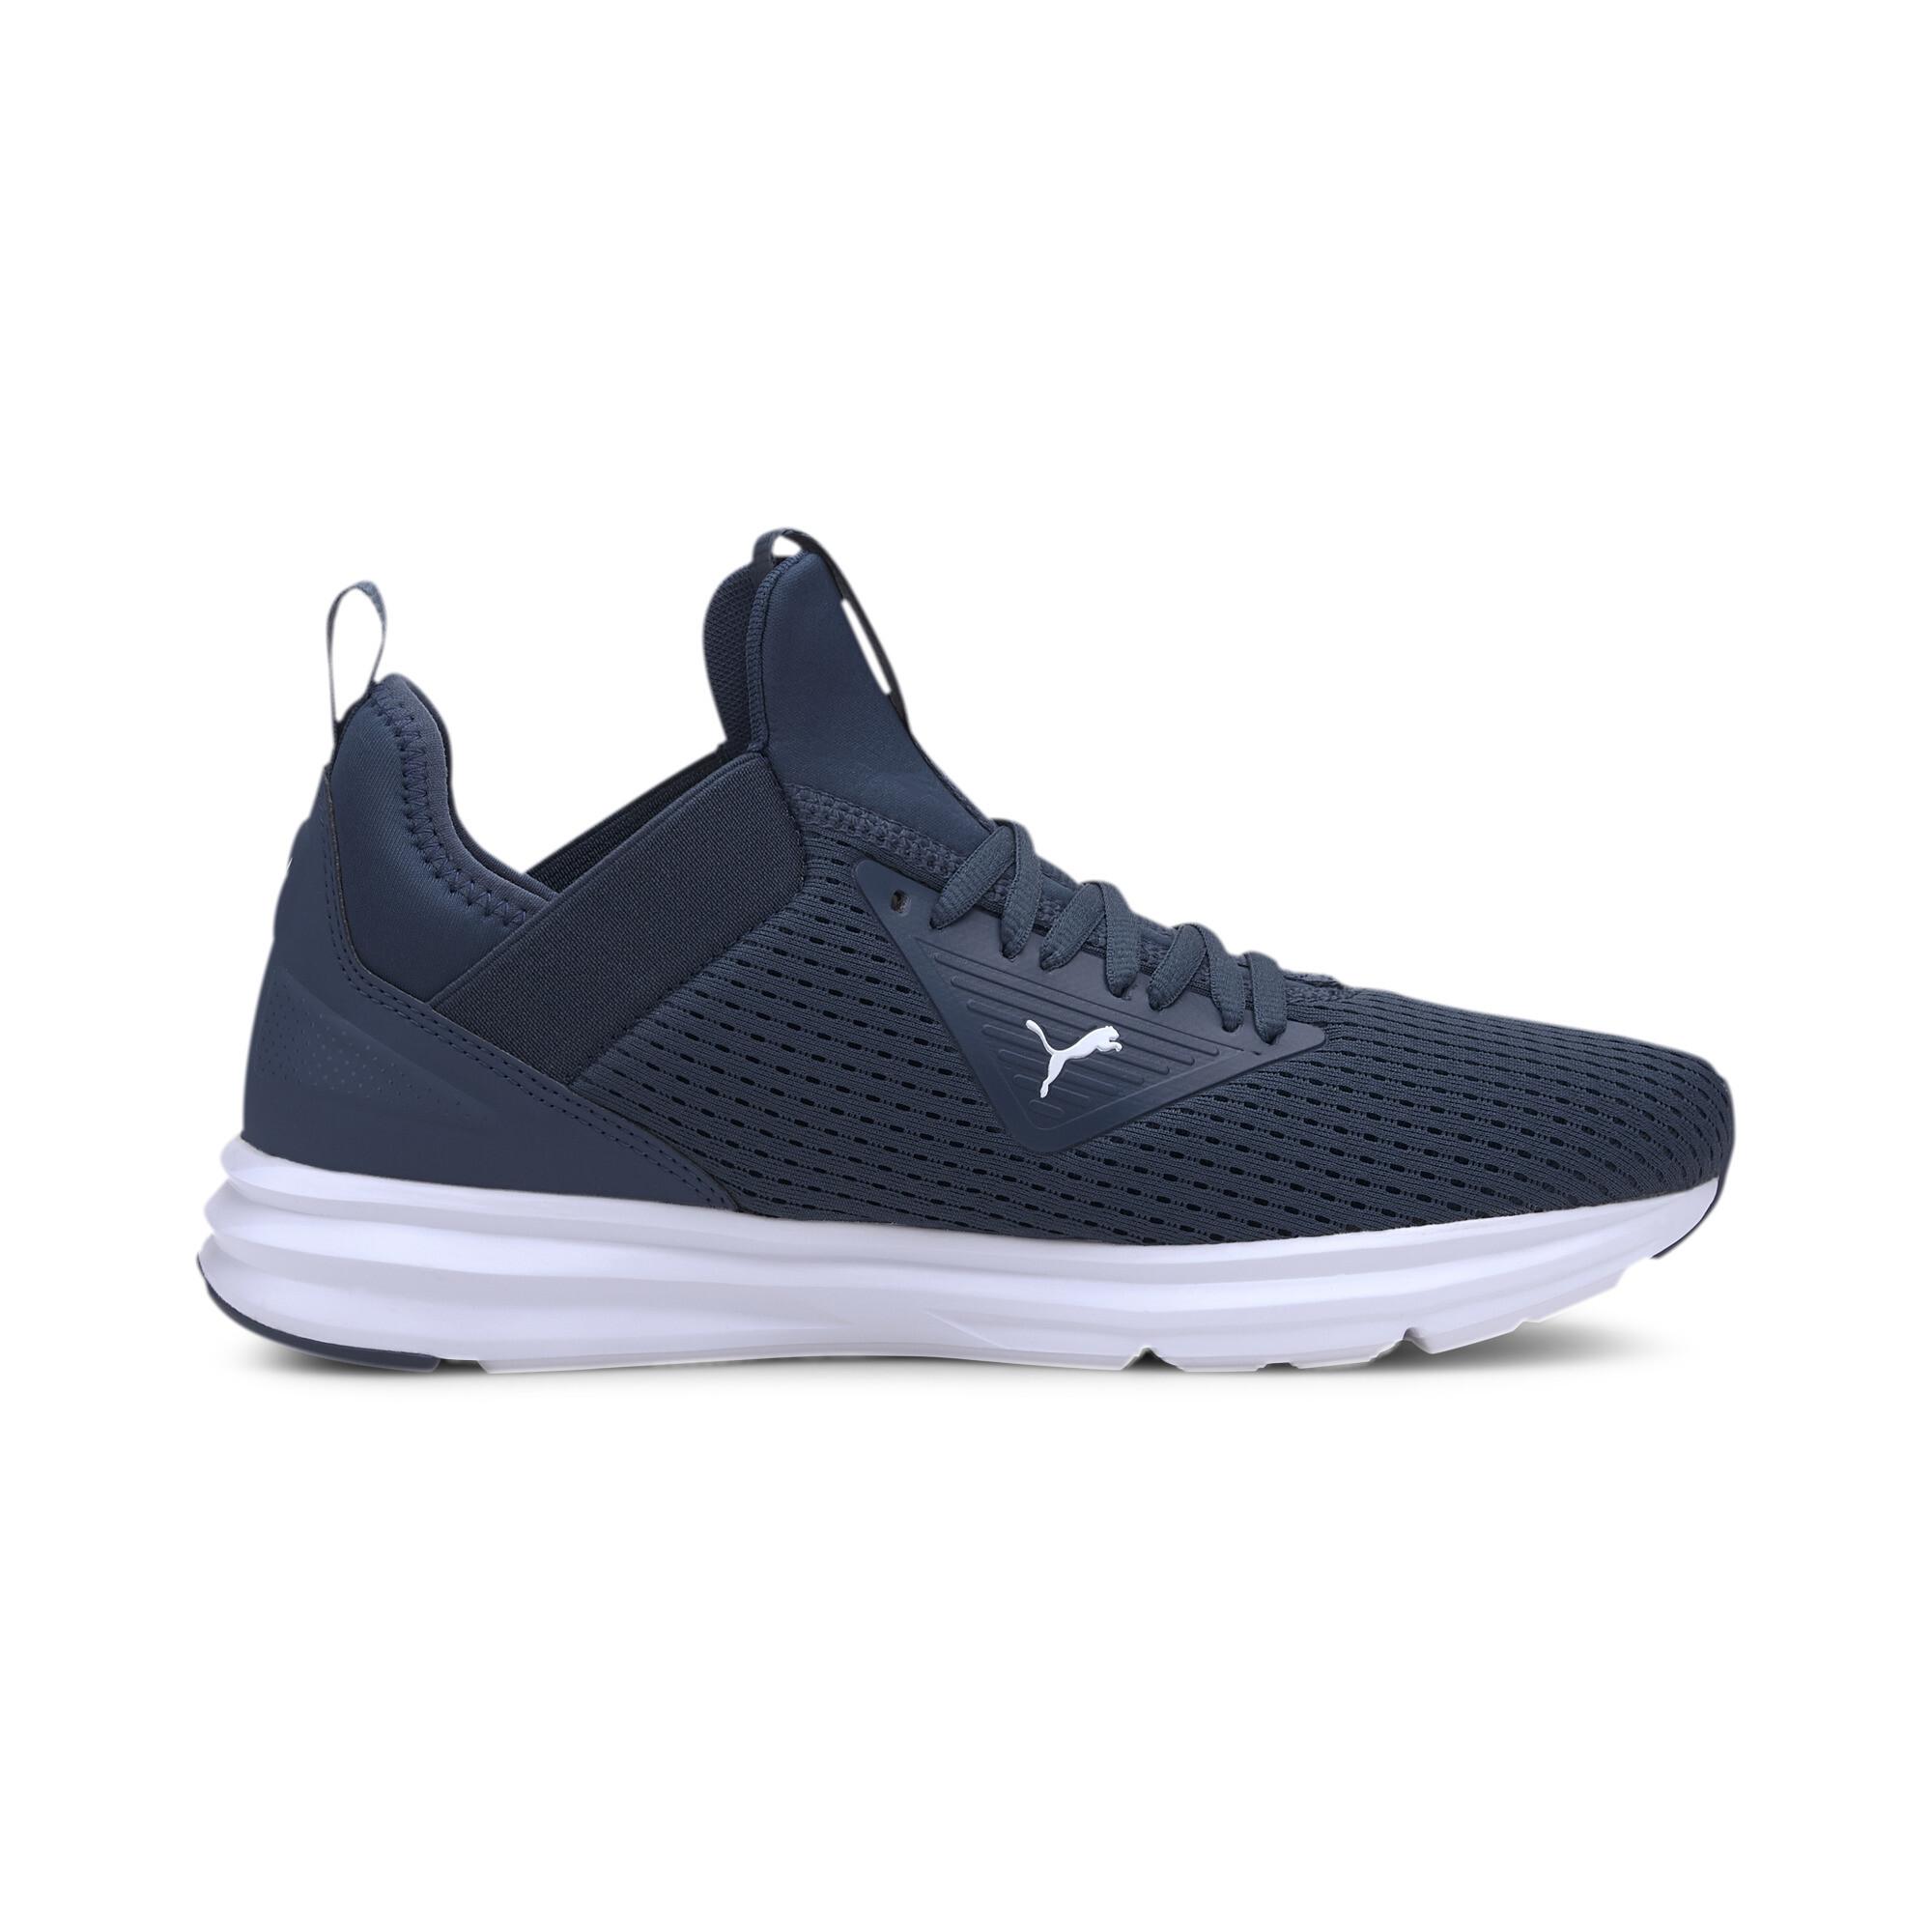 PUMA-Men-039-s-Enzo-Beta-Mesh-Training-Shoes thumbnail 21